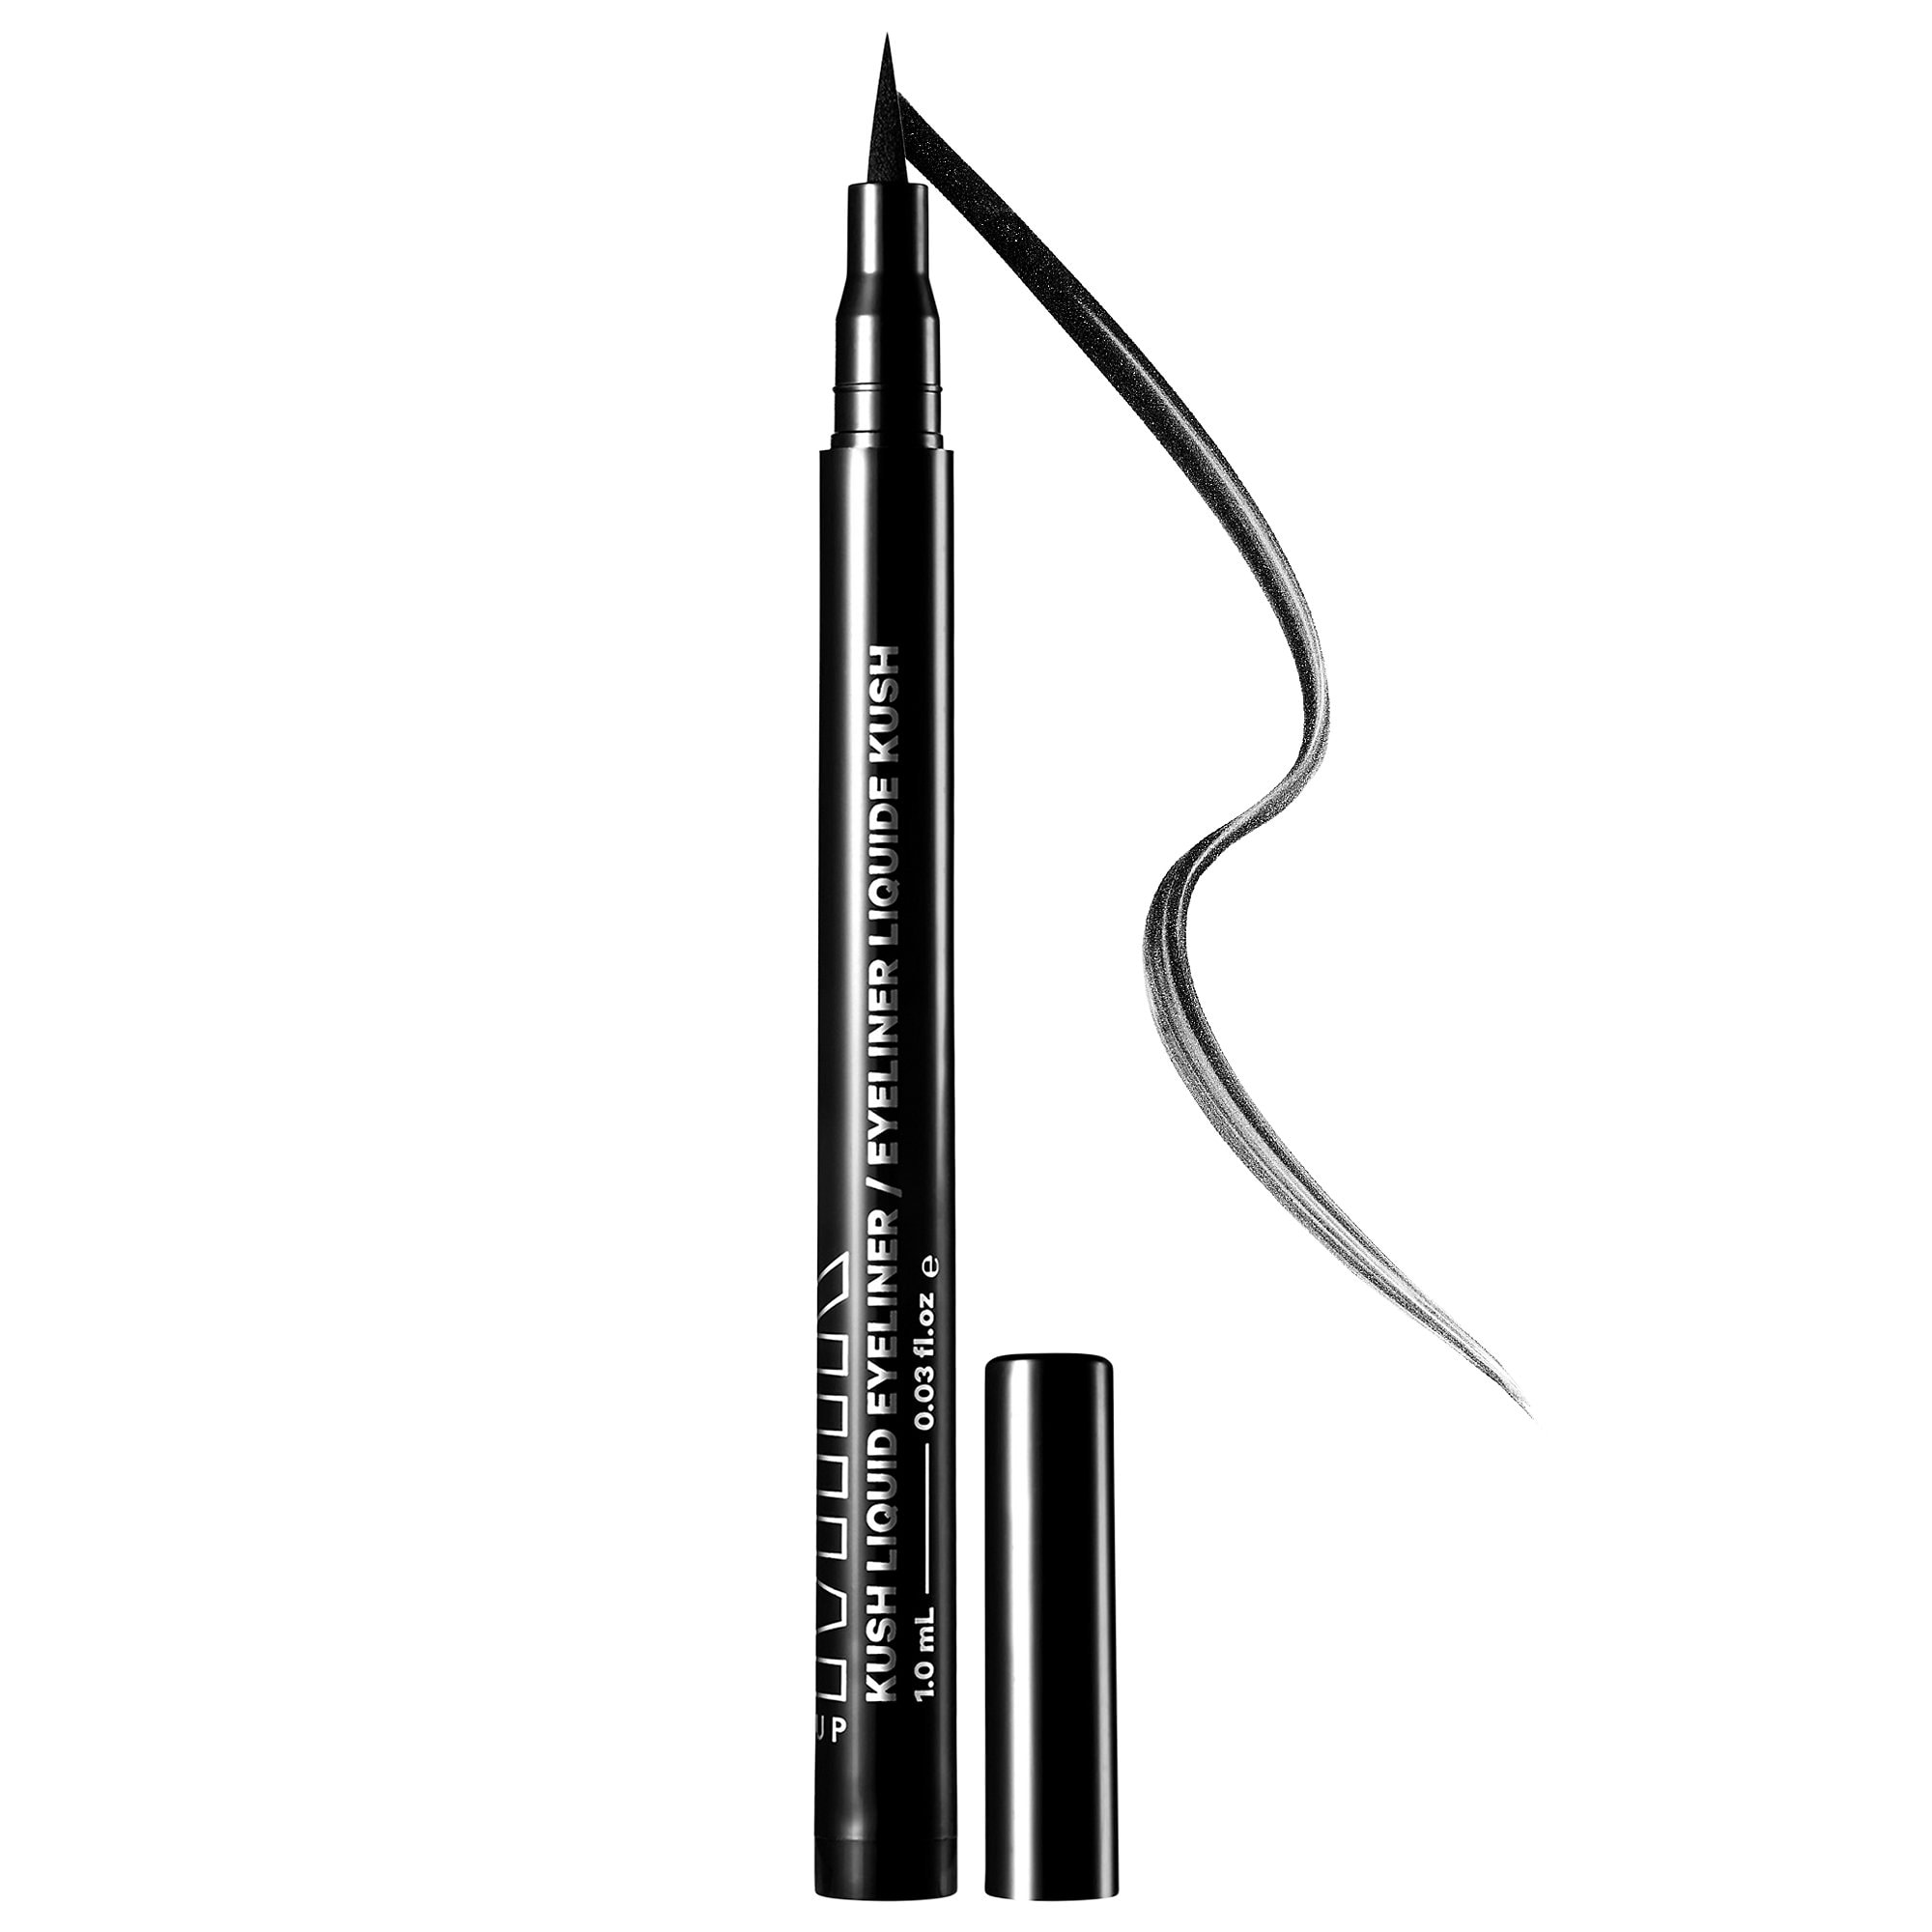 Milk Makeup - KUSH Liquid Eyeliner